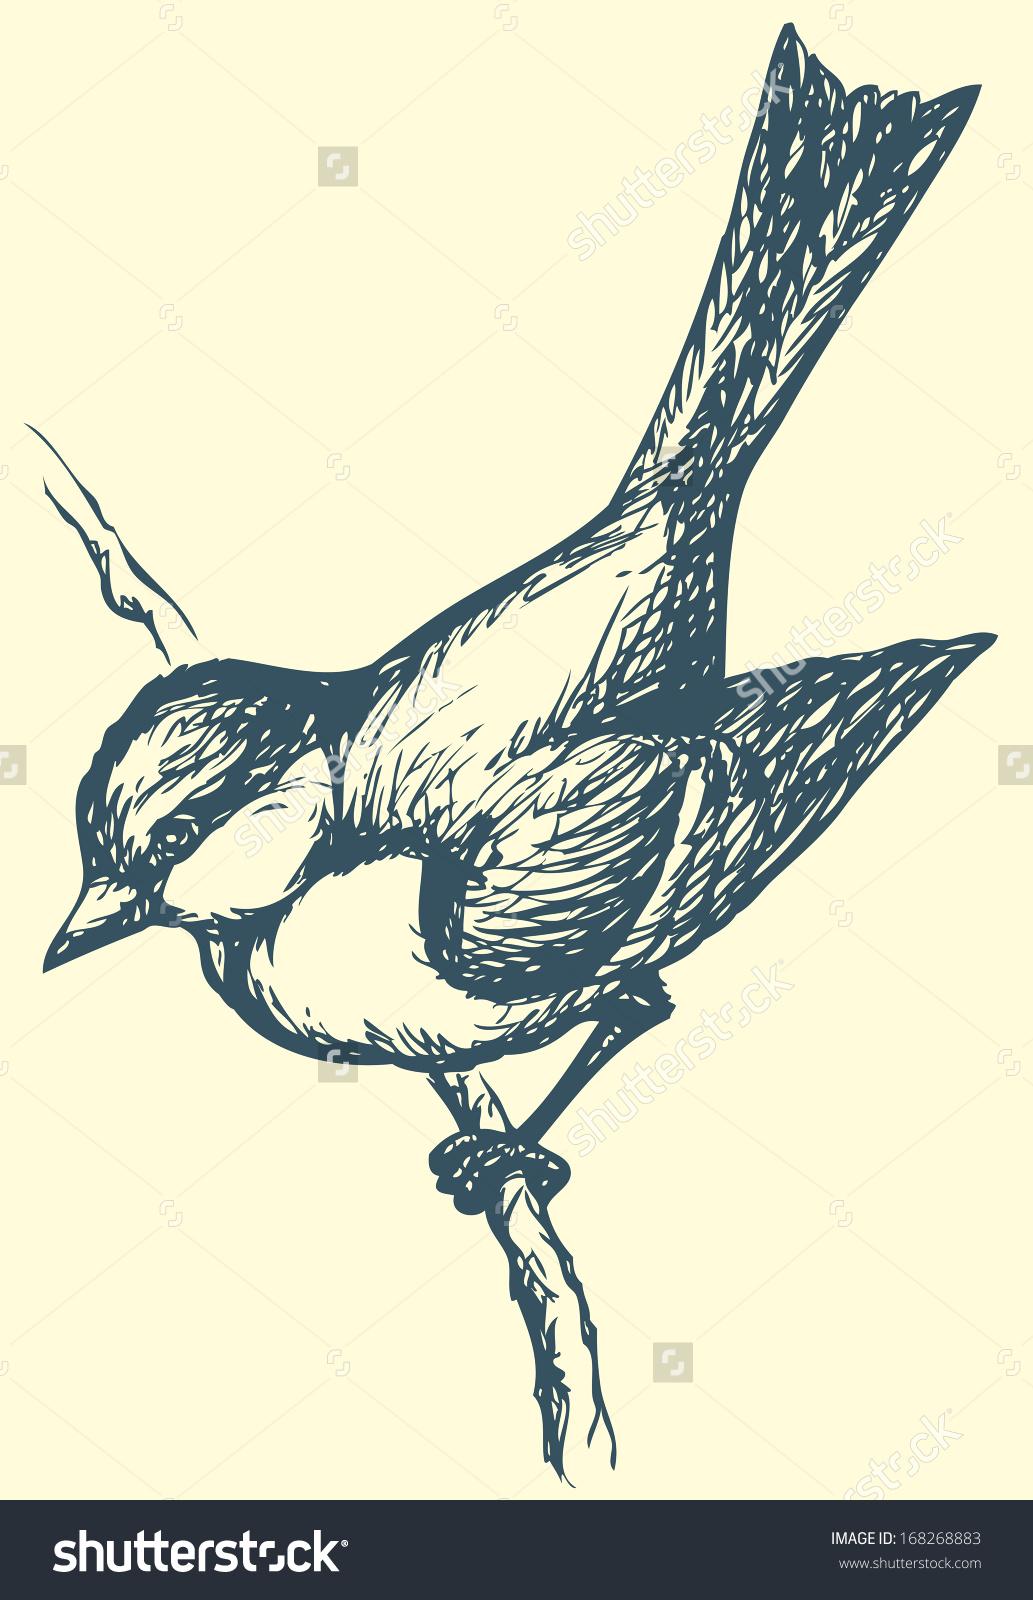 Vector Drawing Series Monochrome Sketches Birds Stock Vector.